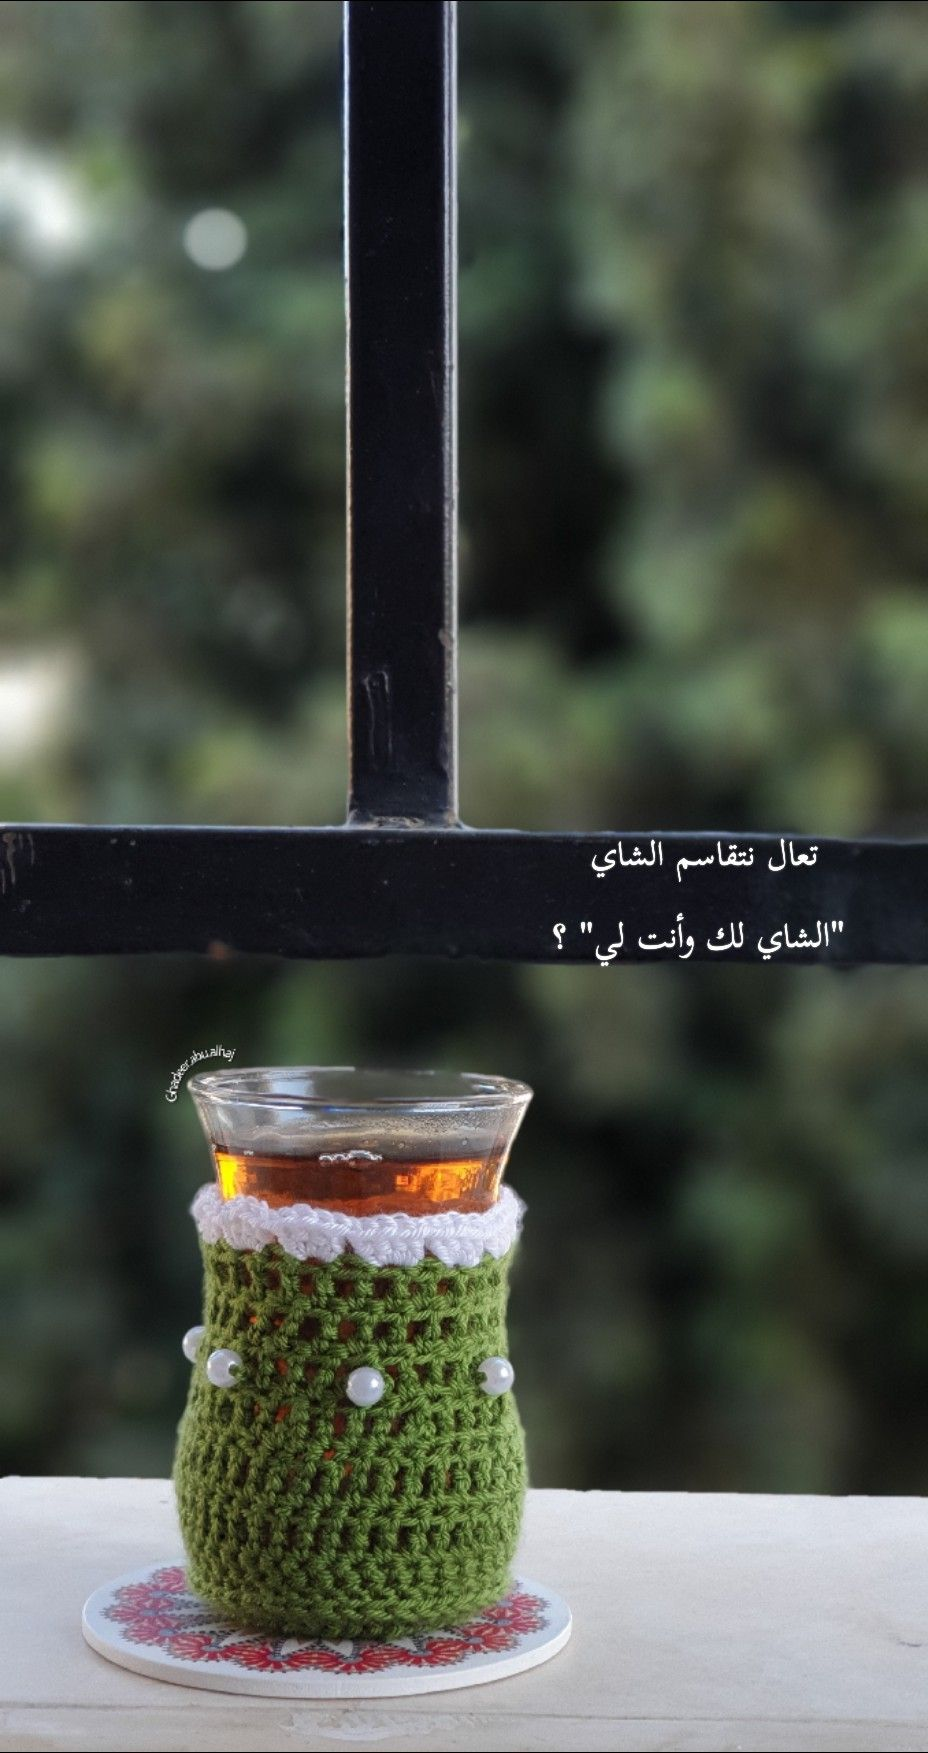 تعال نتقاسم الشاي الشاي لك وأنت لي Instagram Instagram Photo Photo And Video